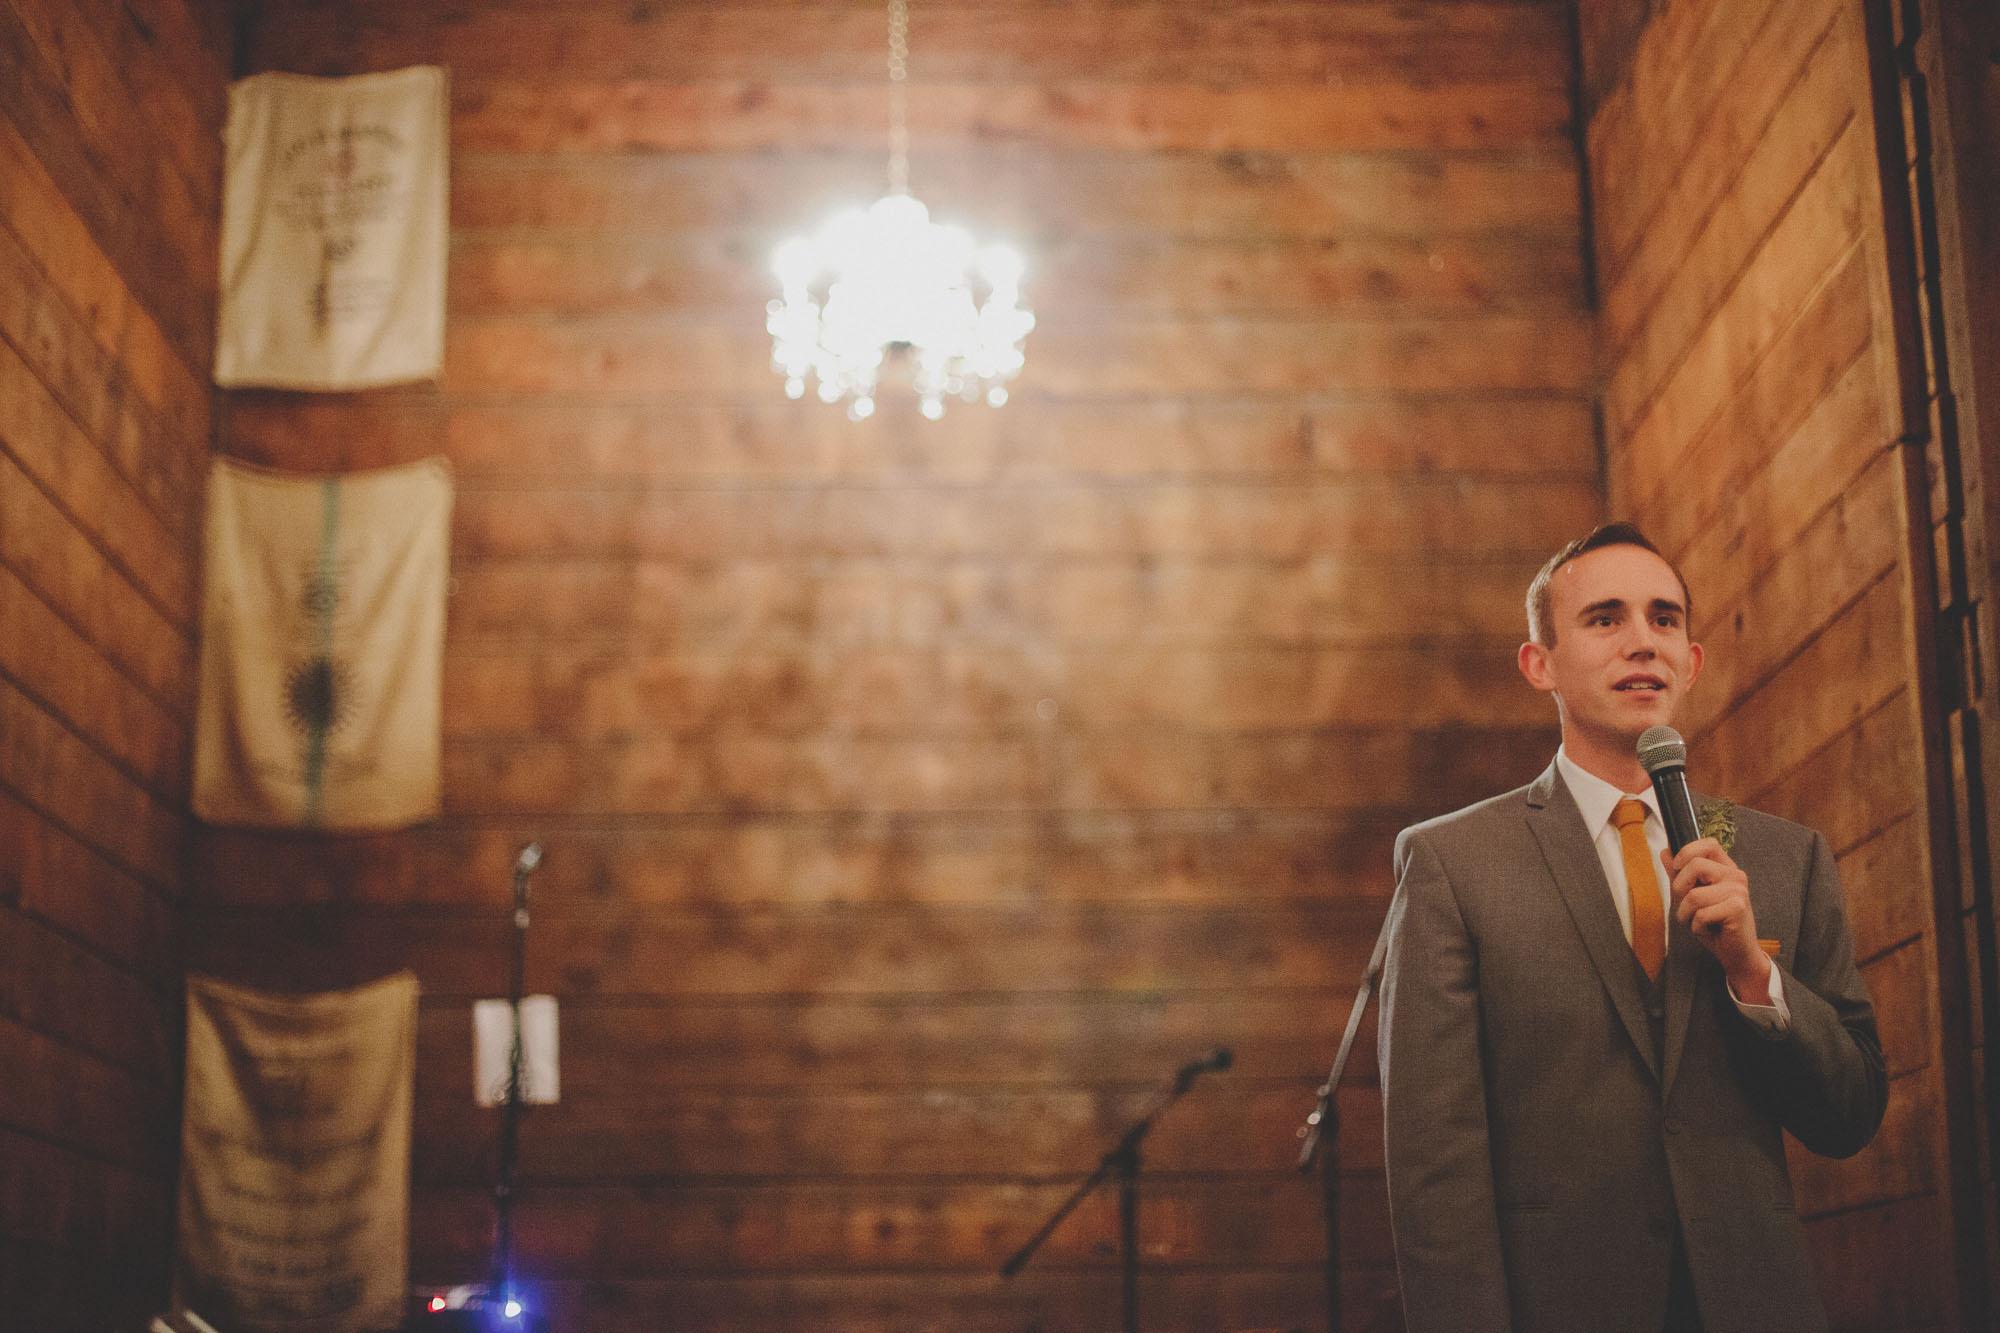 Gretchen_Gause_Petaluma_Olympias_Valley_Wedding_Photo-330.jpg